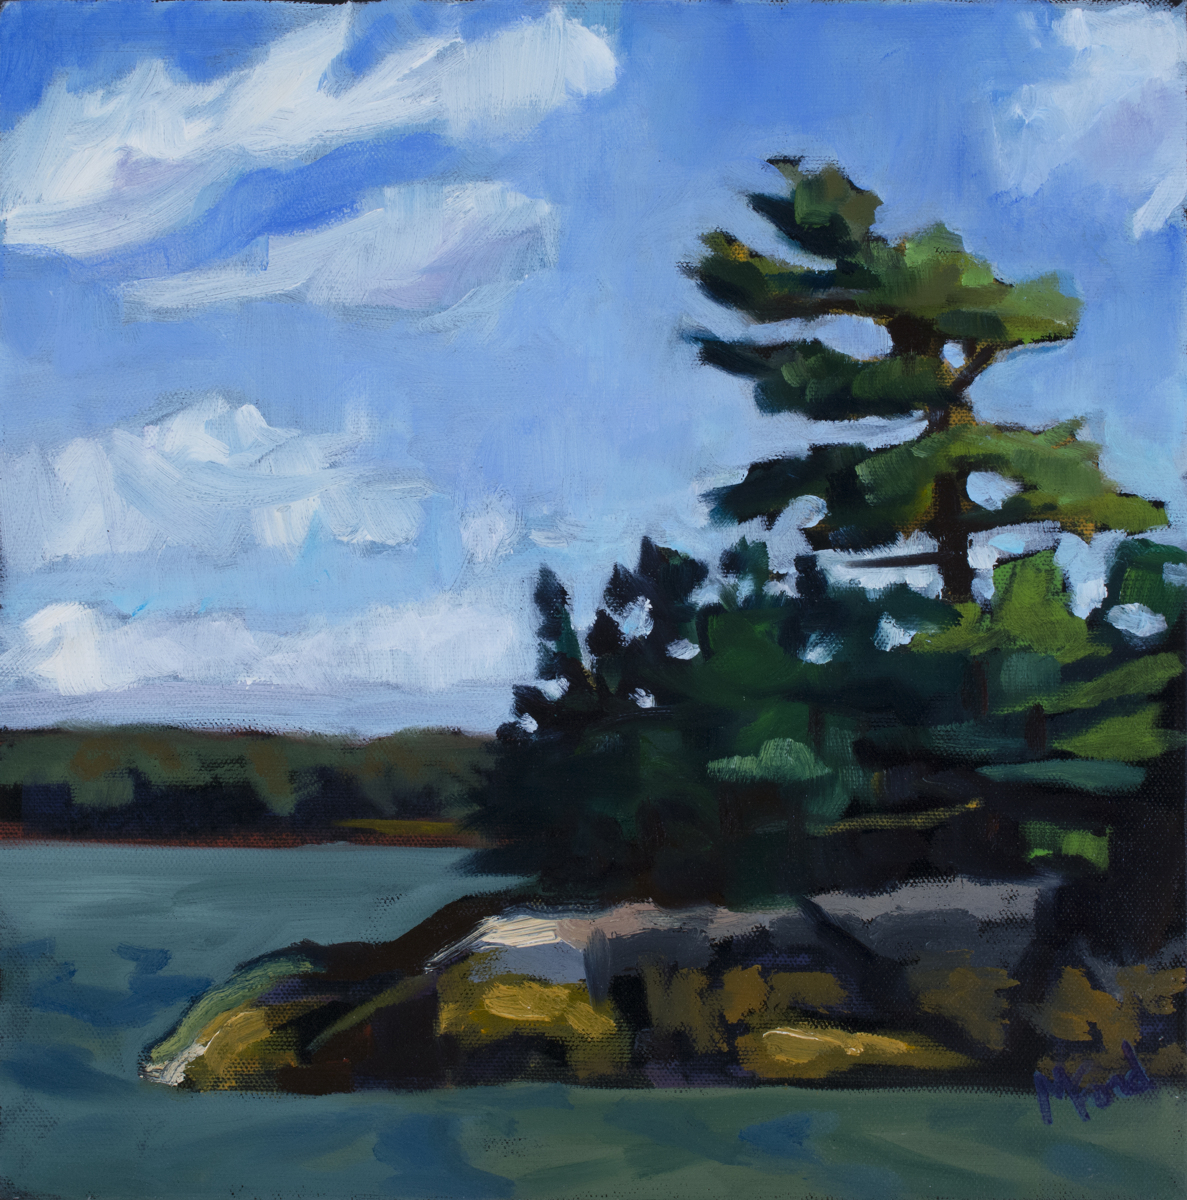 White Pine (large view)